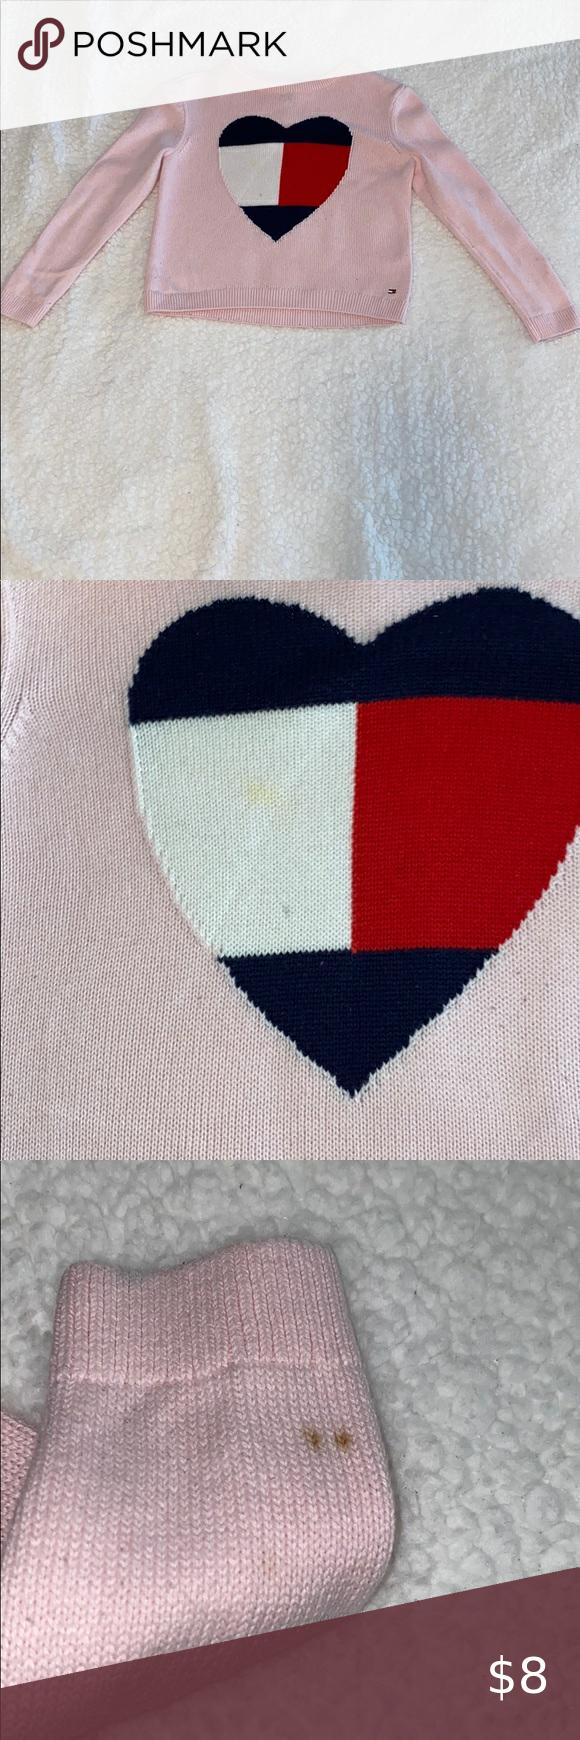 Tommy Hilfiger Little Girls Sweater Size S (6-7) T